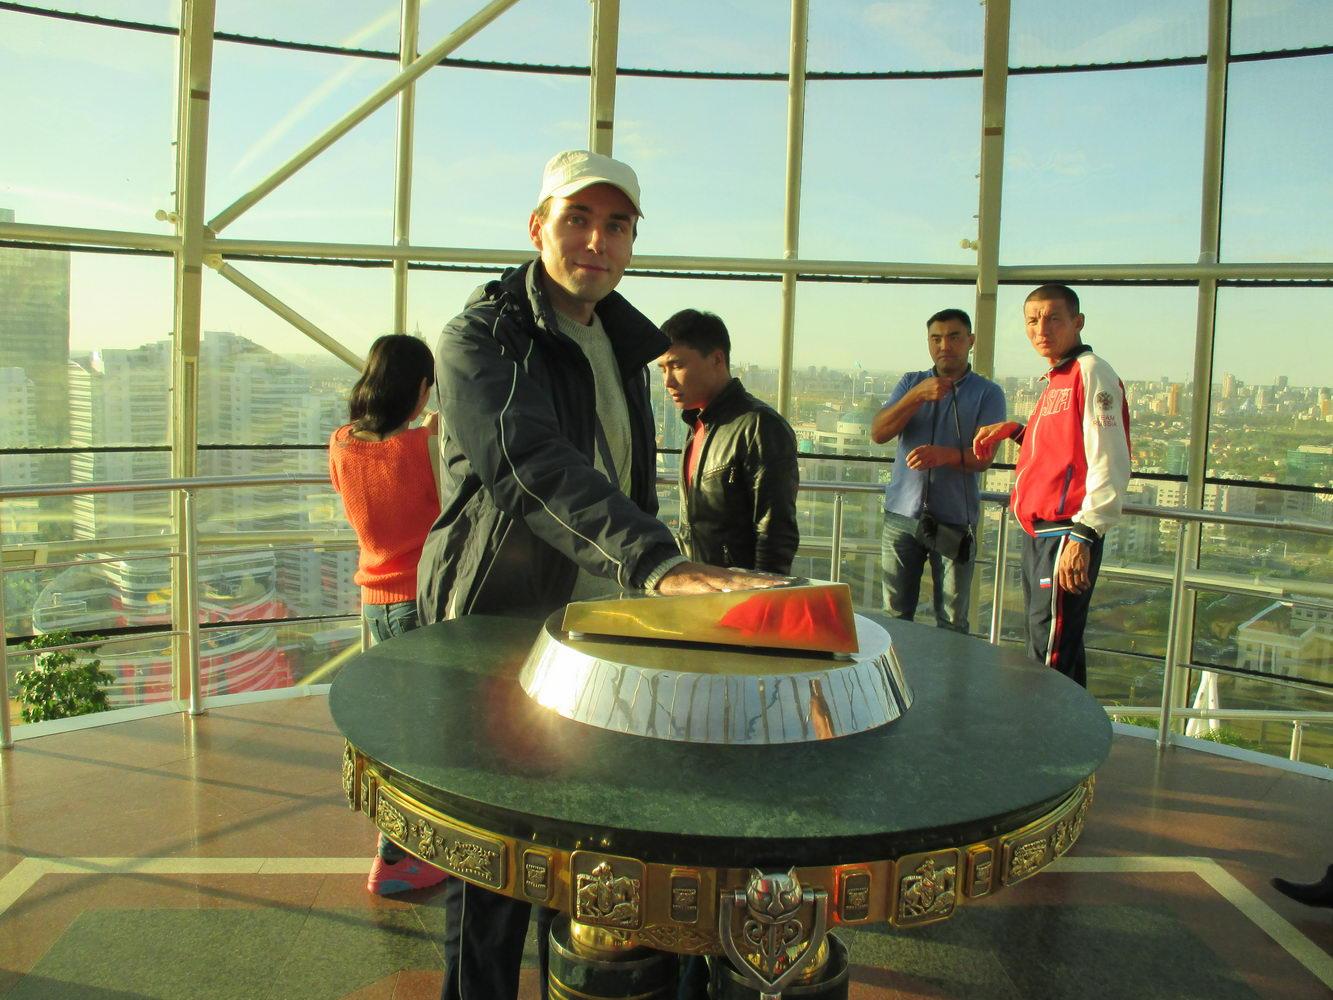 байтерек внутри. золотой отпечаток руки назарбаева. астана. символ казахстана